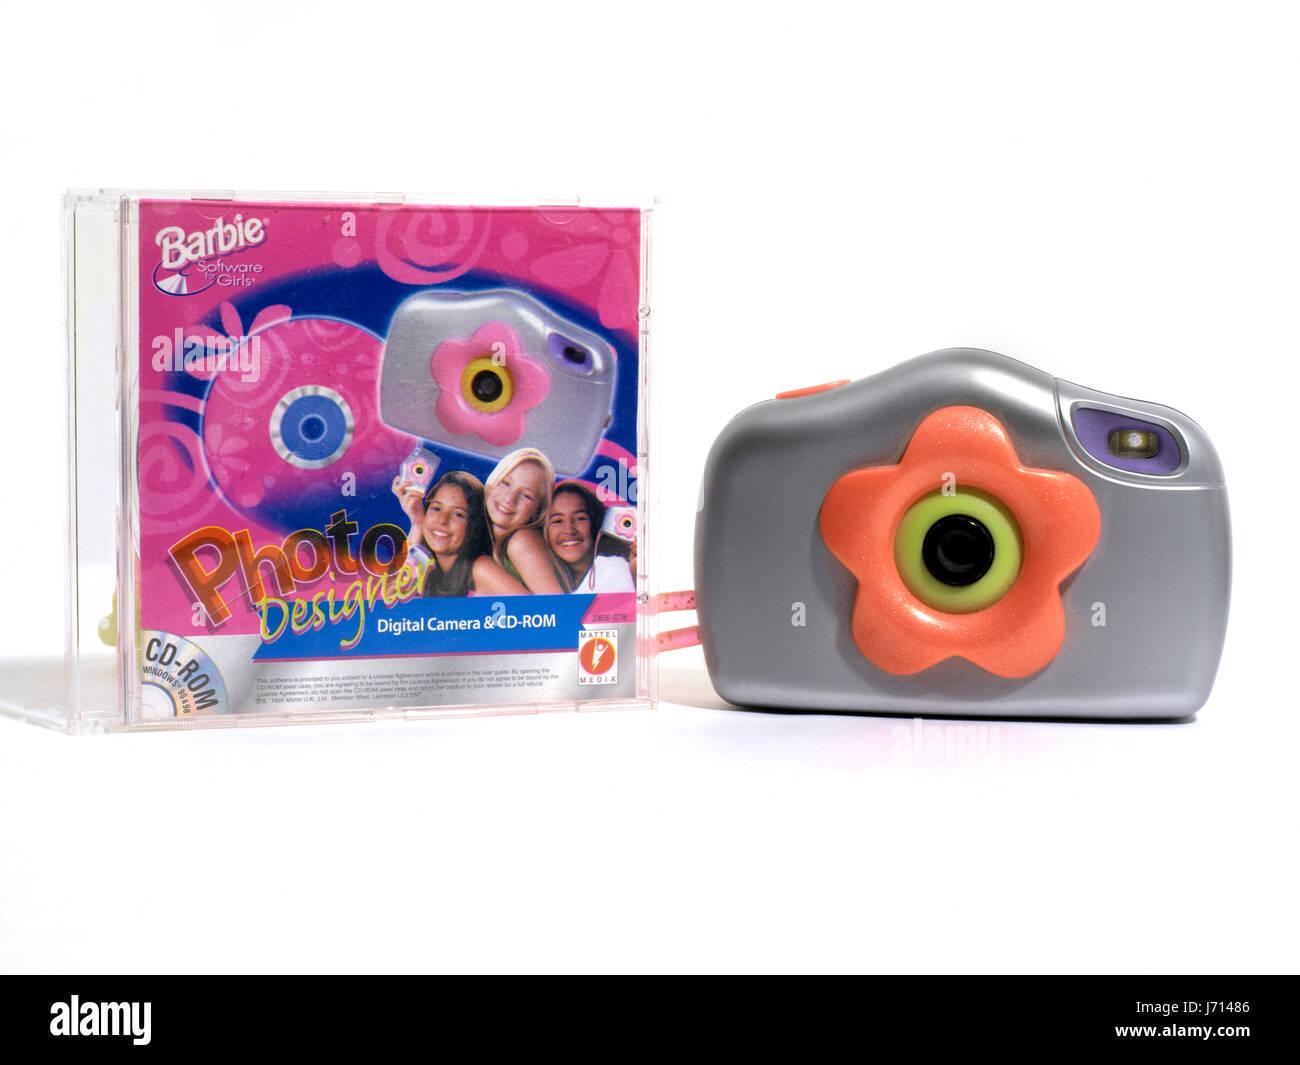 Barbie Digital Camera and CD-ROM - Stock Image